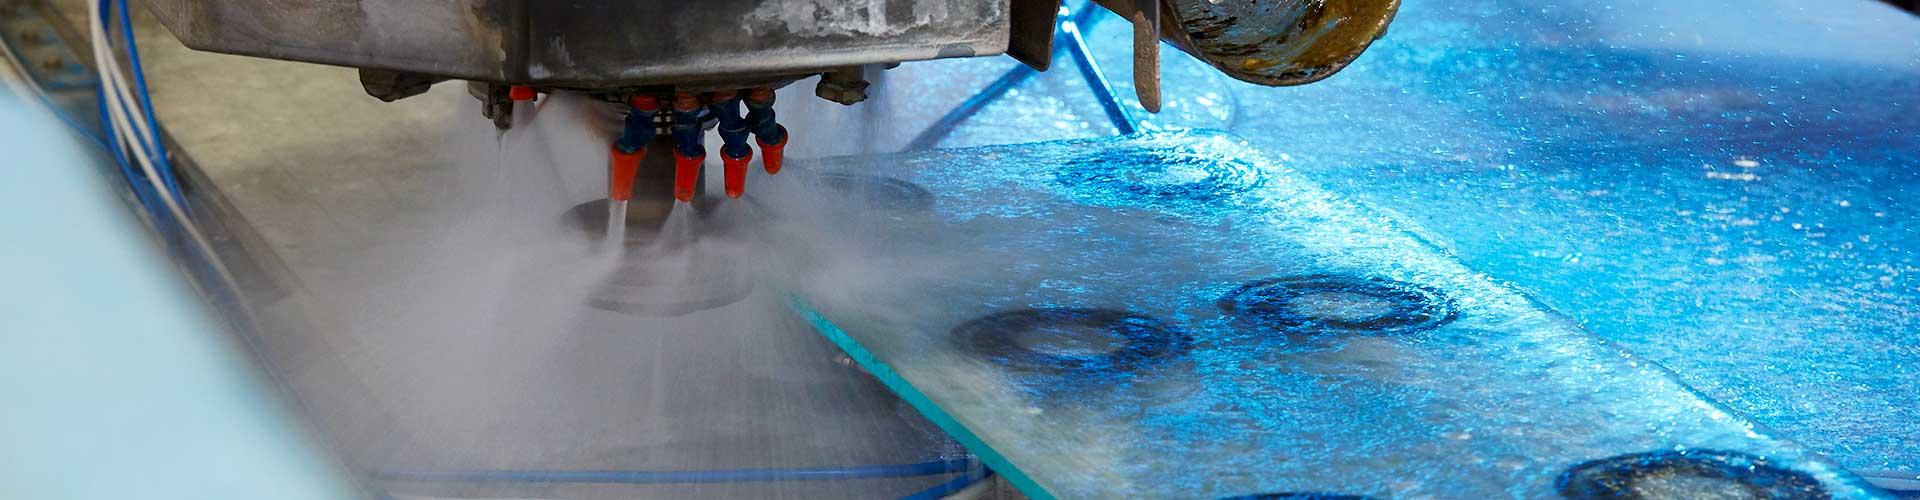 Automated machine polishing glass edges at abc Glass Processing